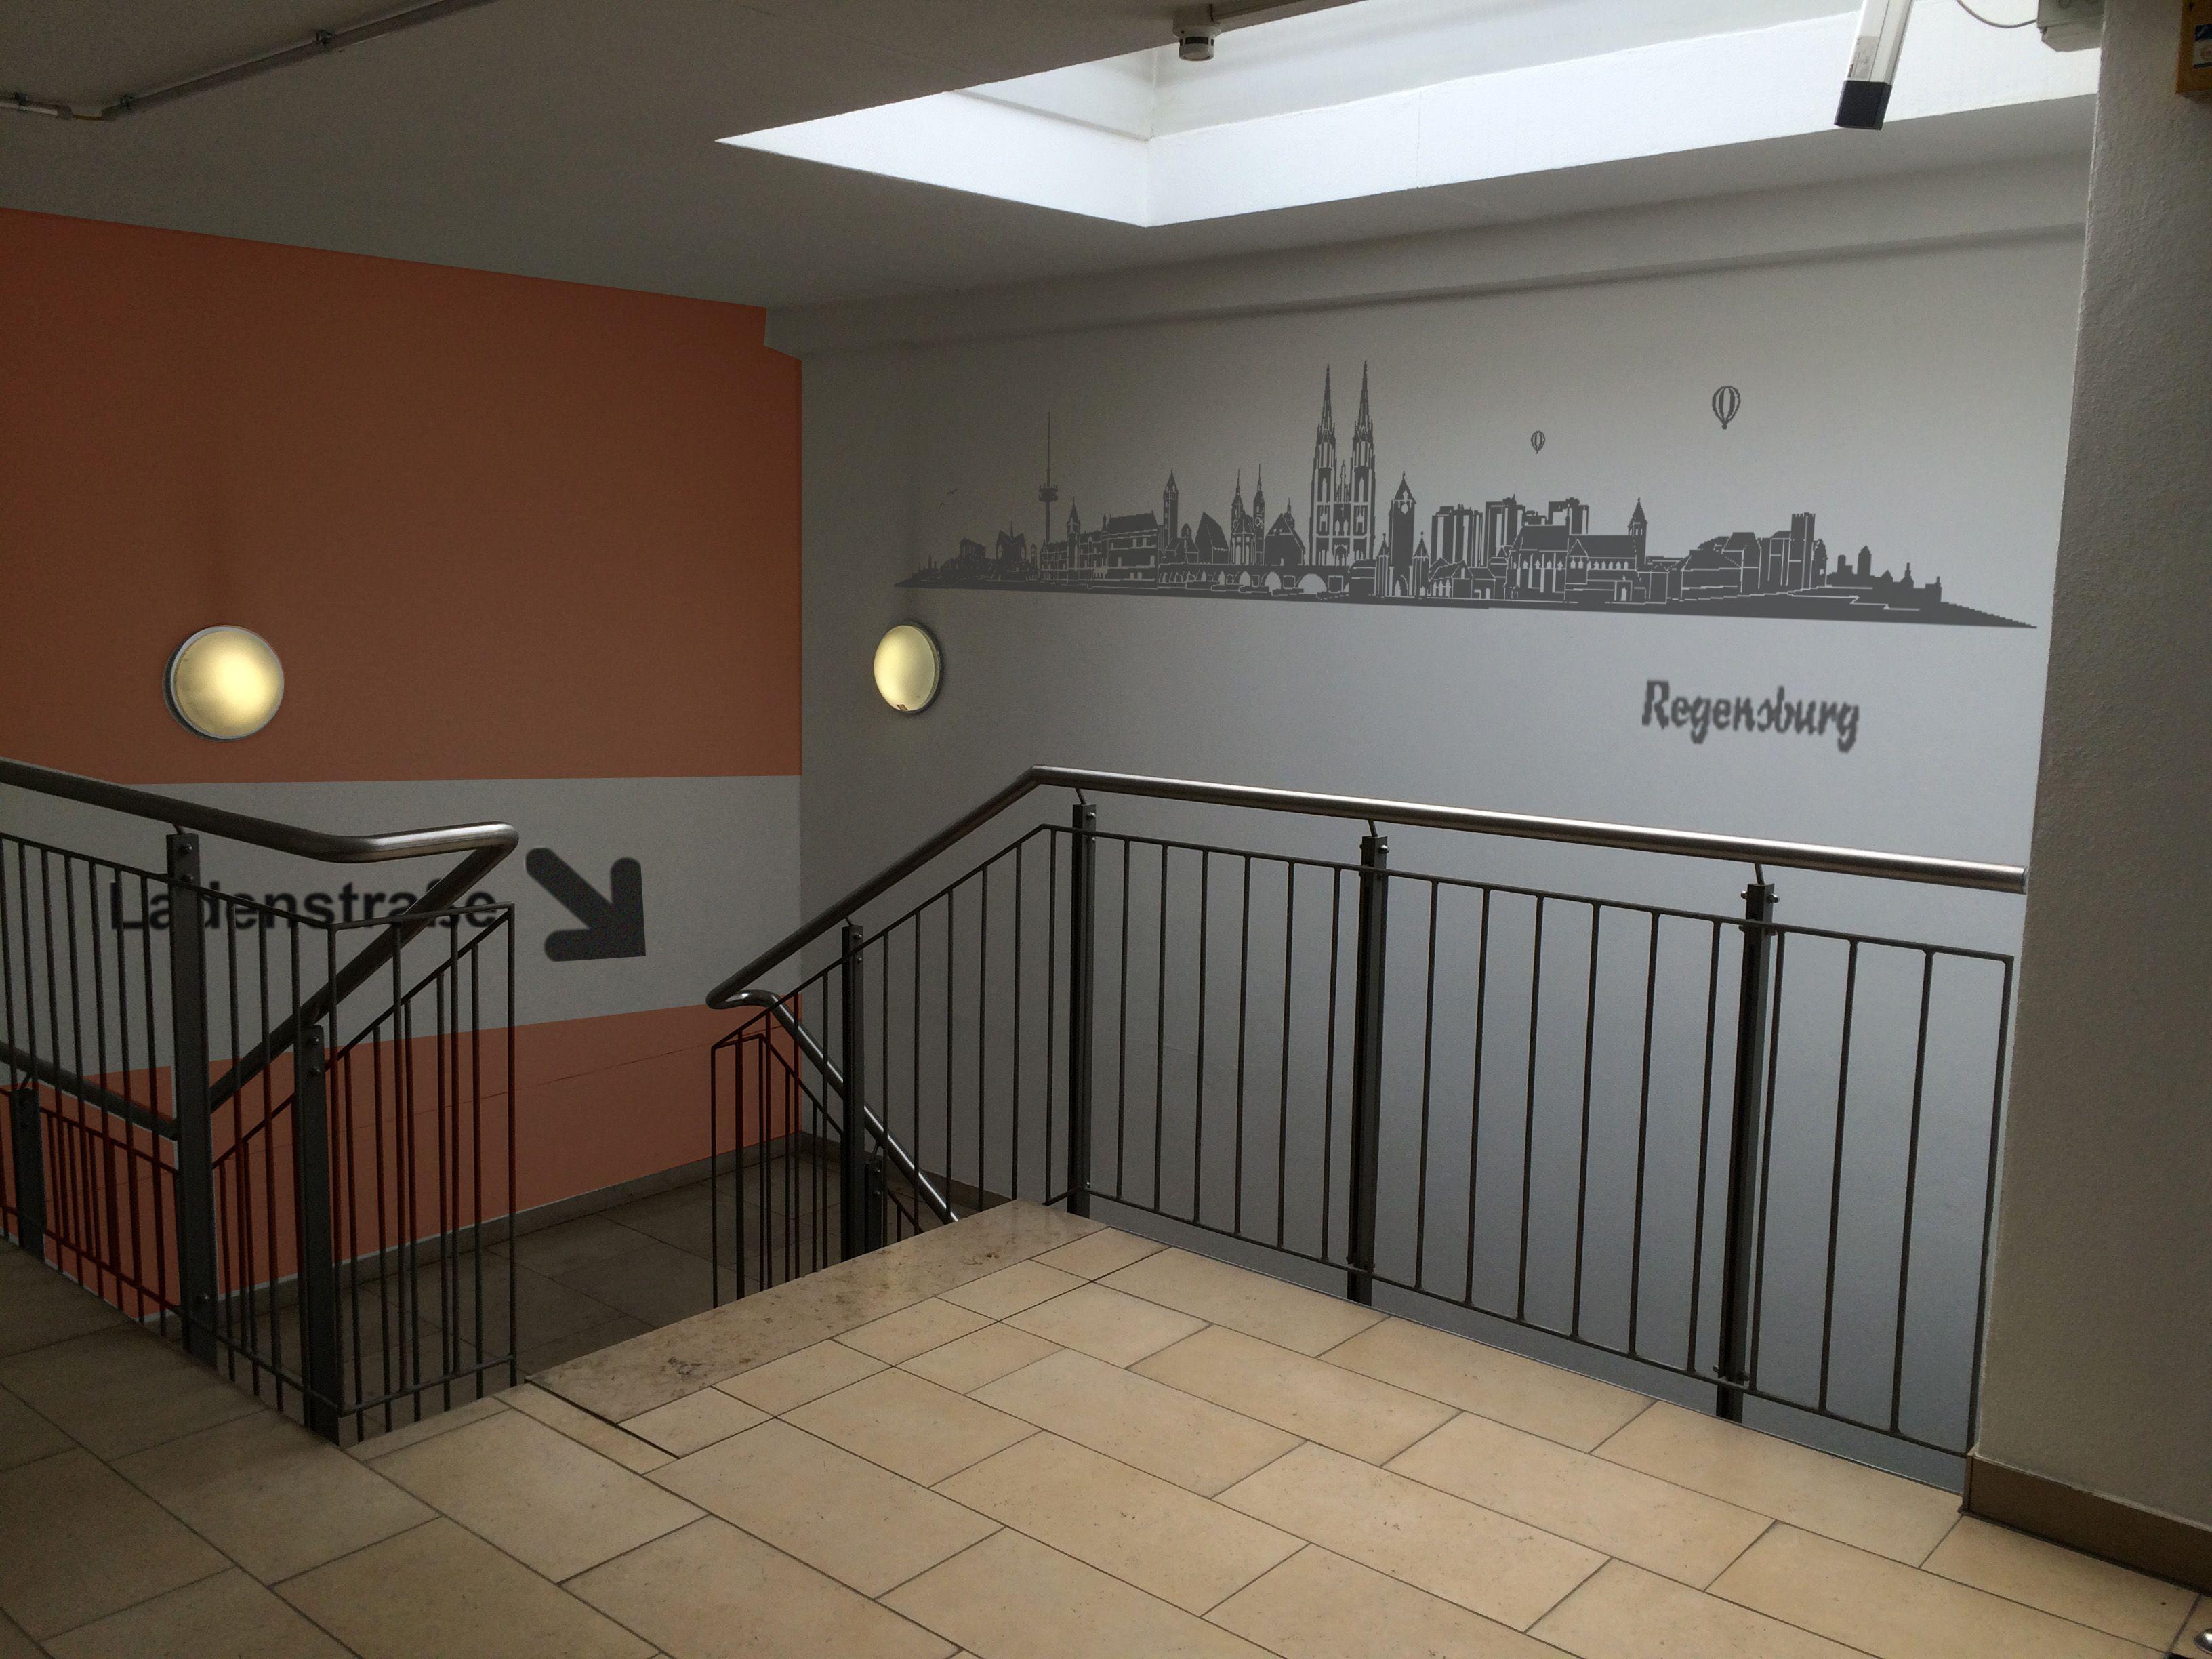 Treppenhausgestaltung in den #Regensburg #Arcaden - digitaler ...